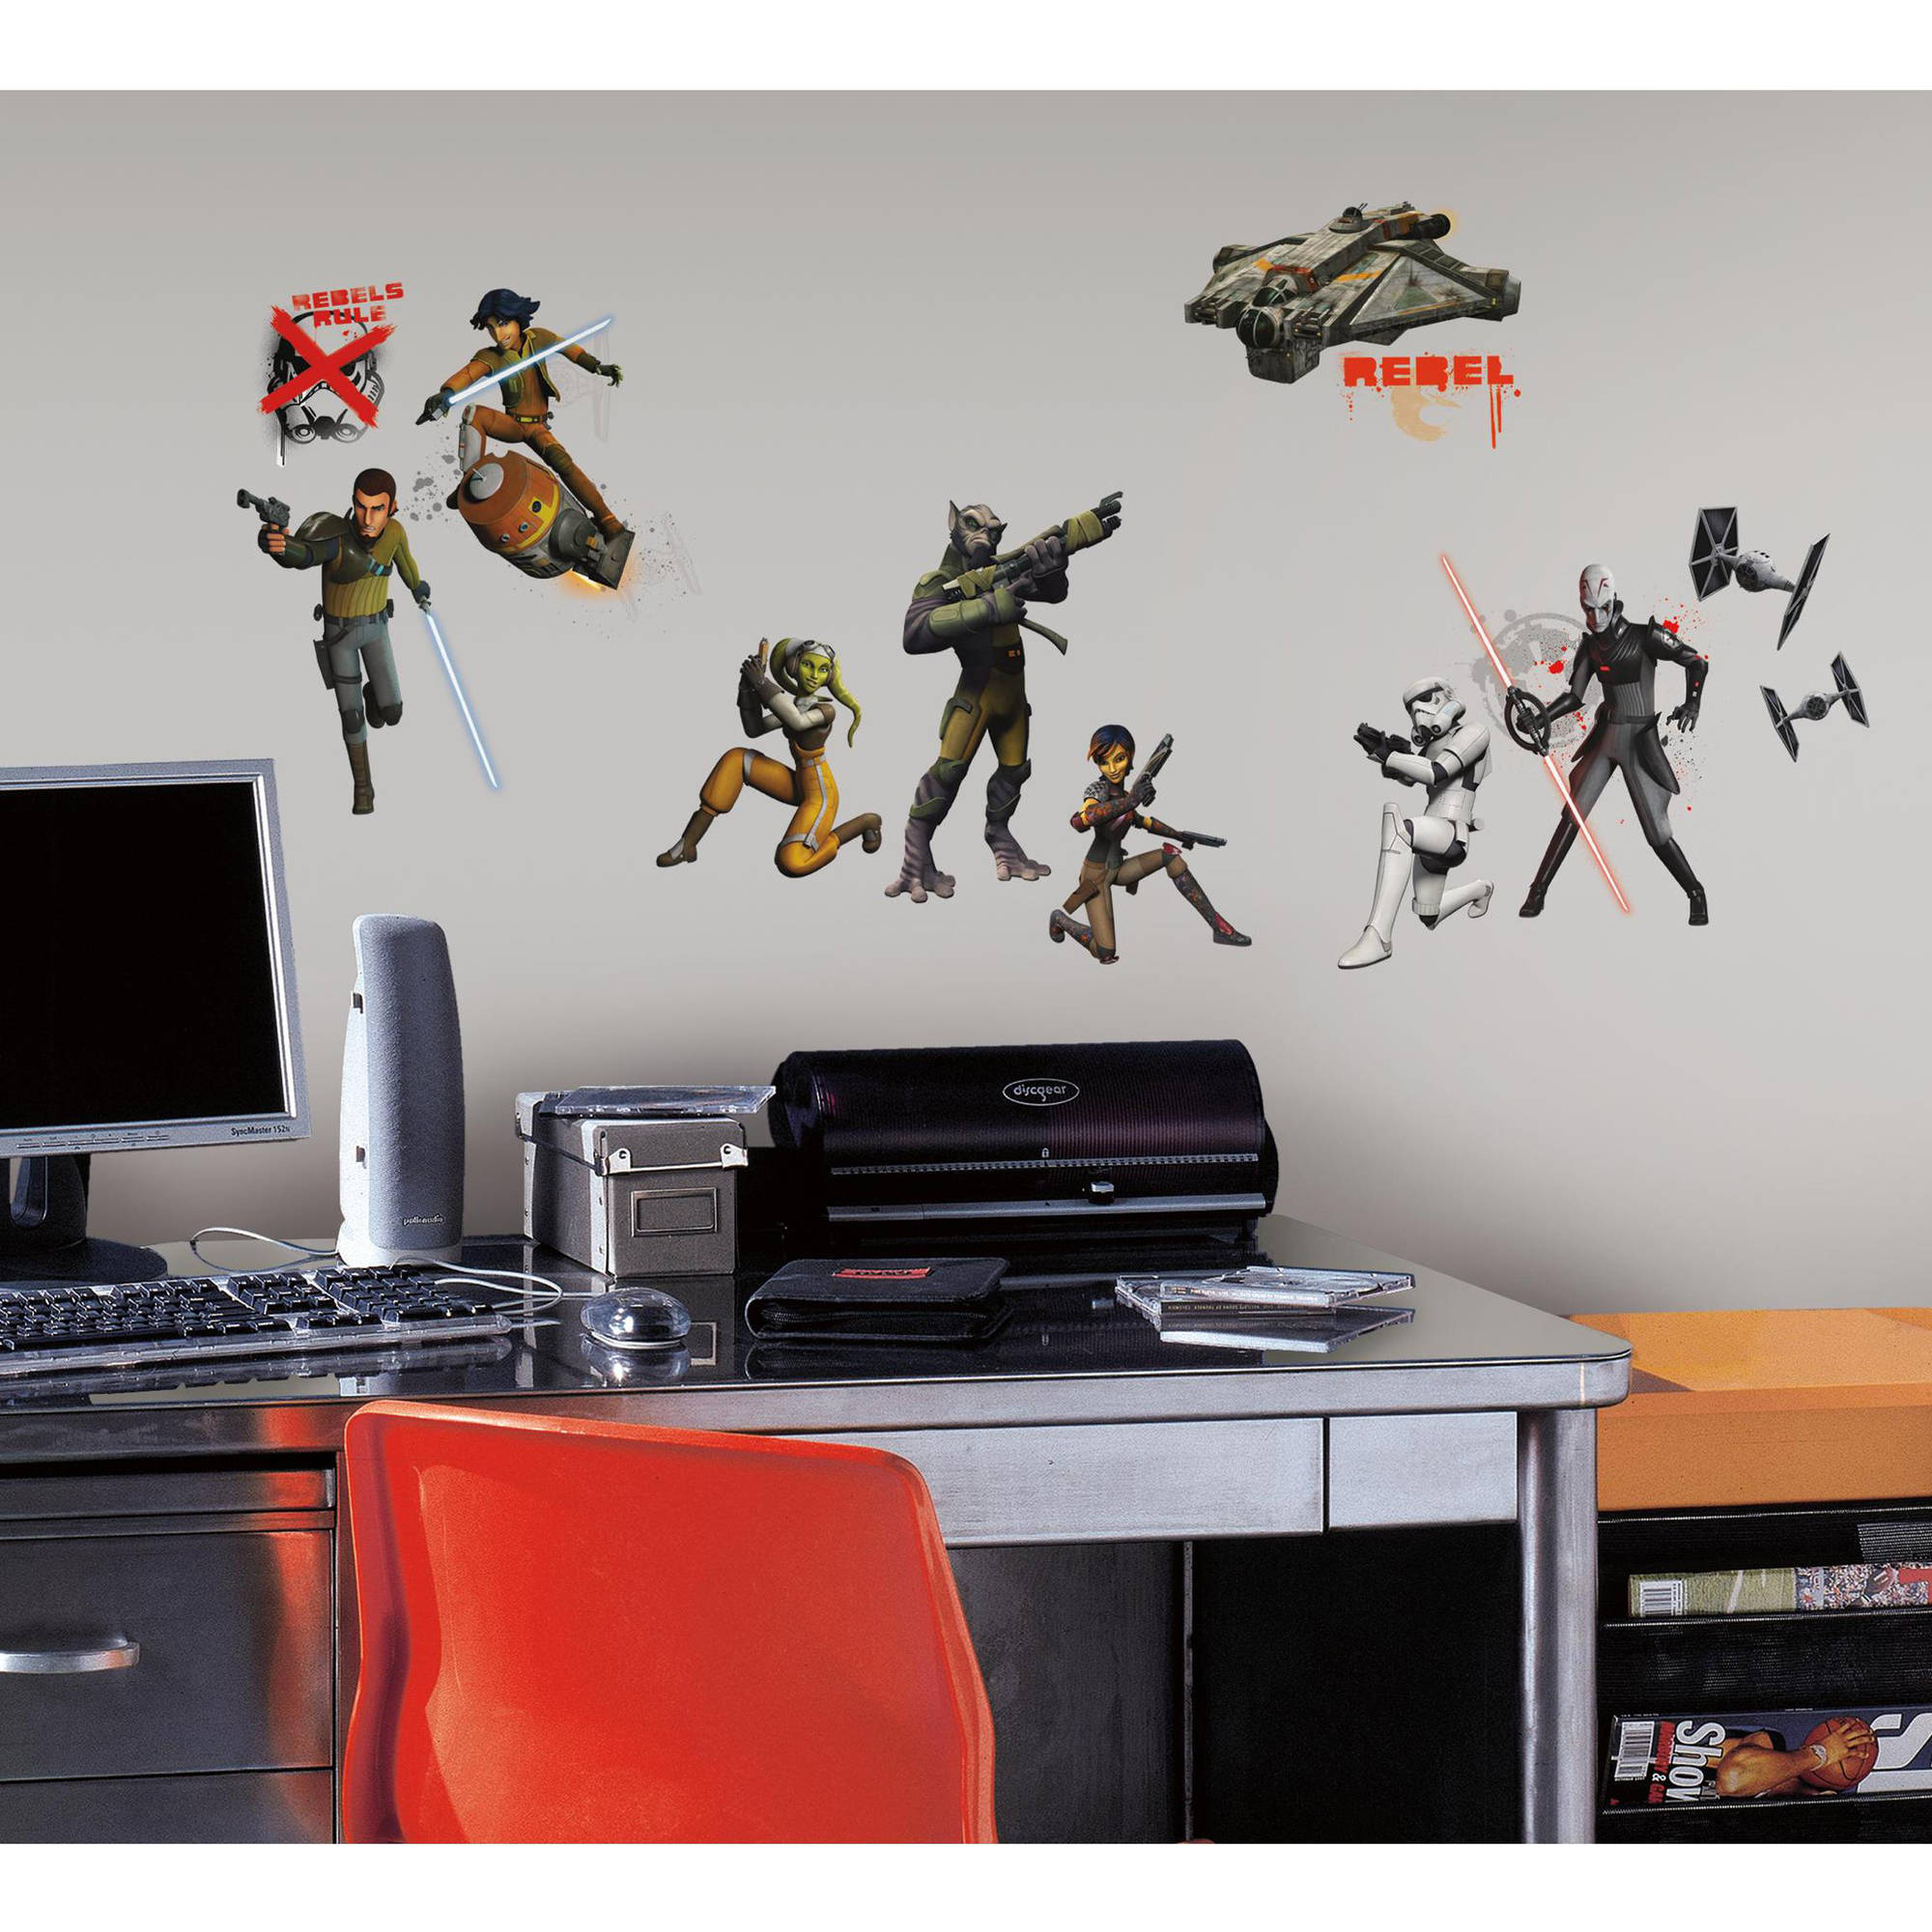 Star Wars Rebels Peel and Stick Wall Decals - Walmart.com